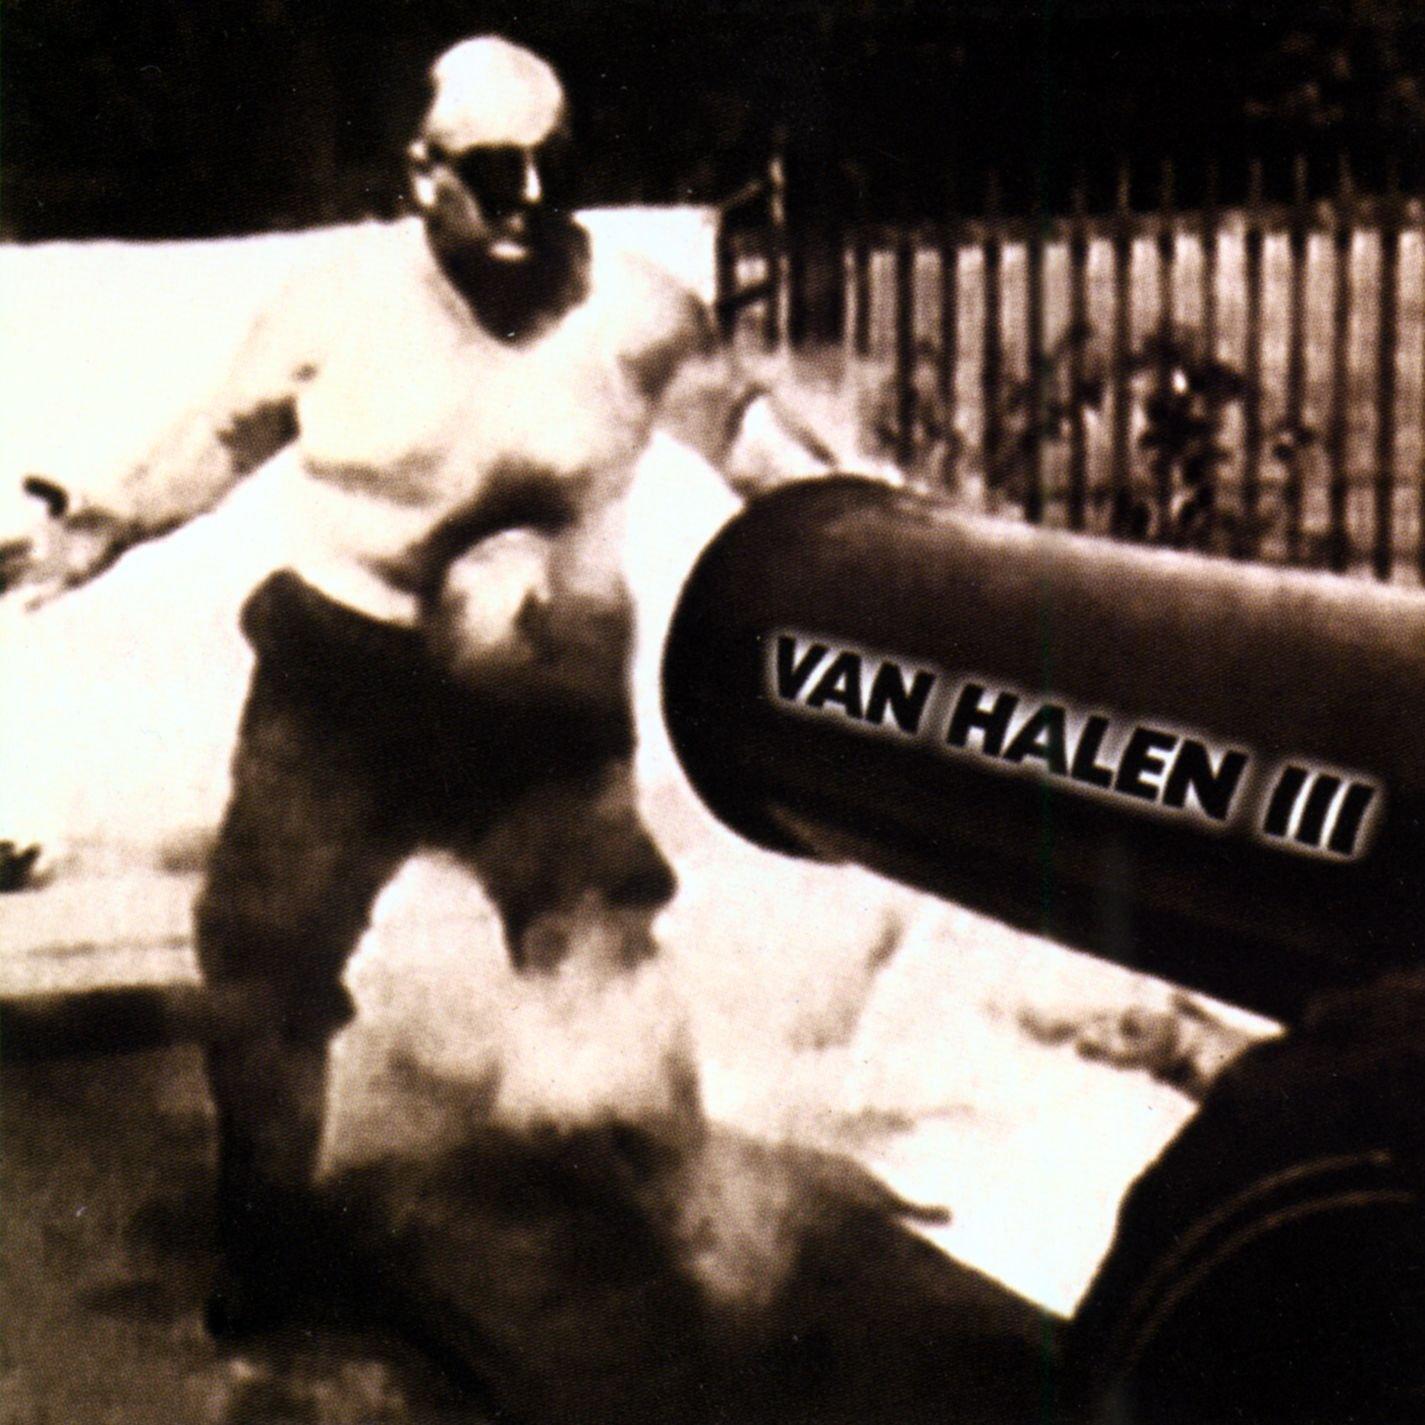 Van Halen Iii Vinyl Van Halen Van Halen Iii